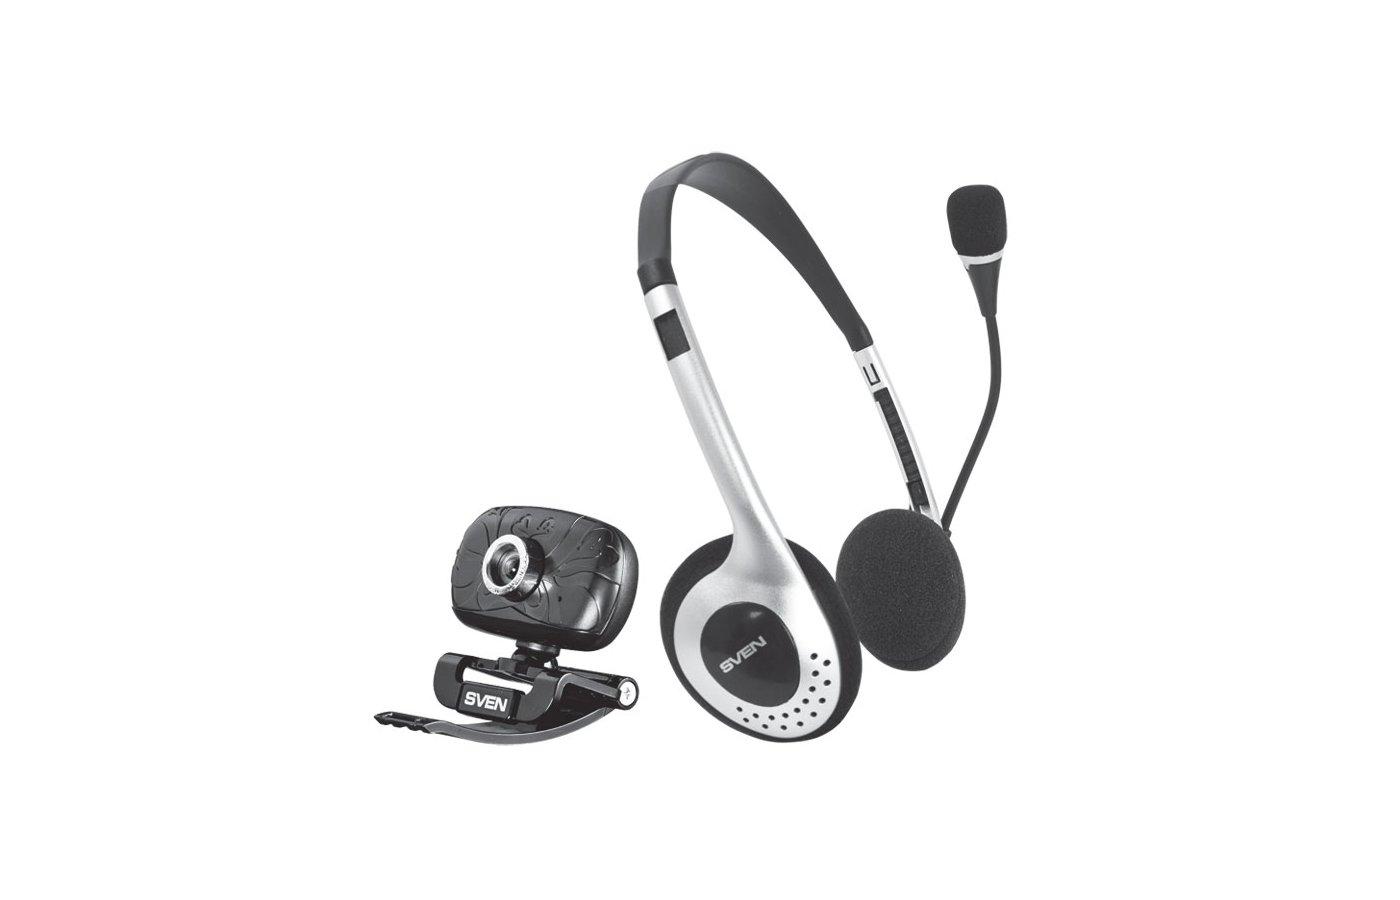 Веб-камера SVEN ICH-3500 Набор веб-камера + гарнитура